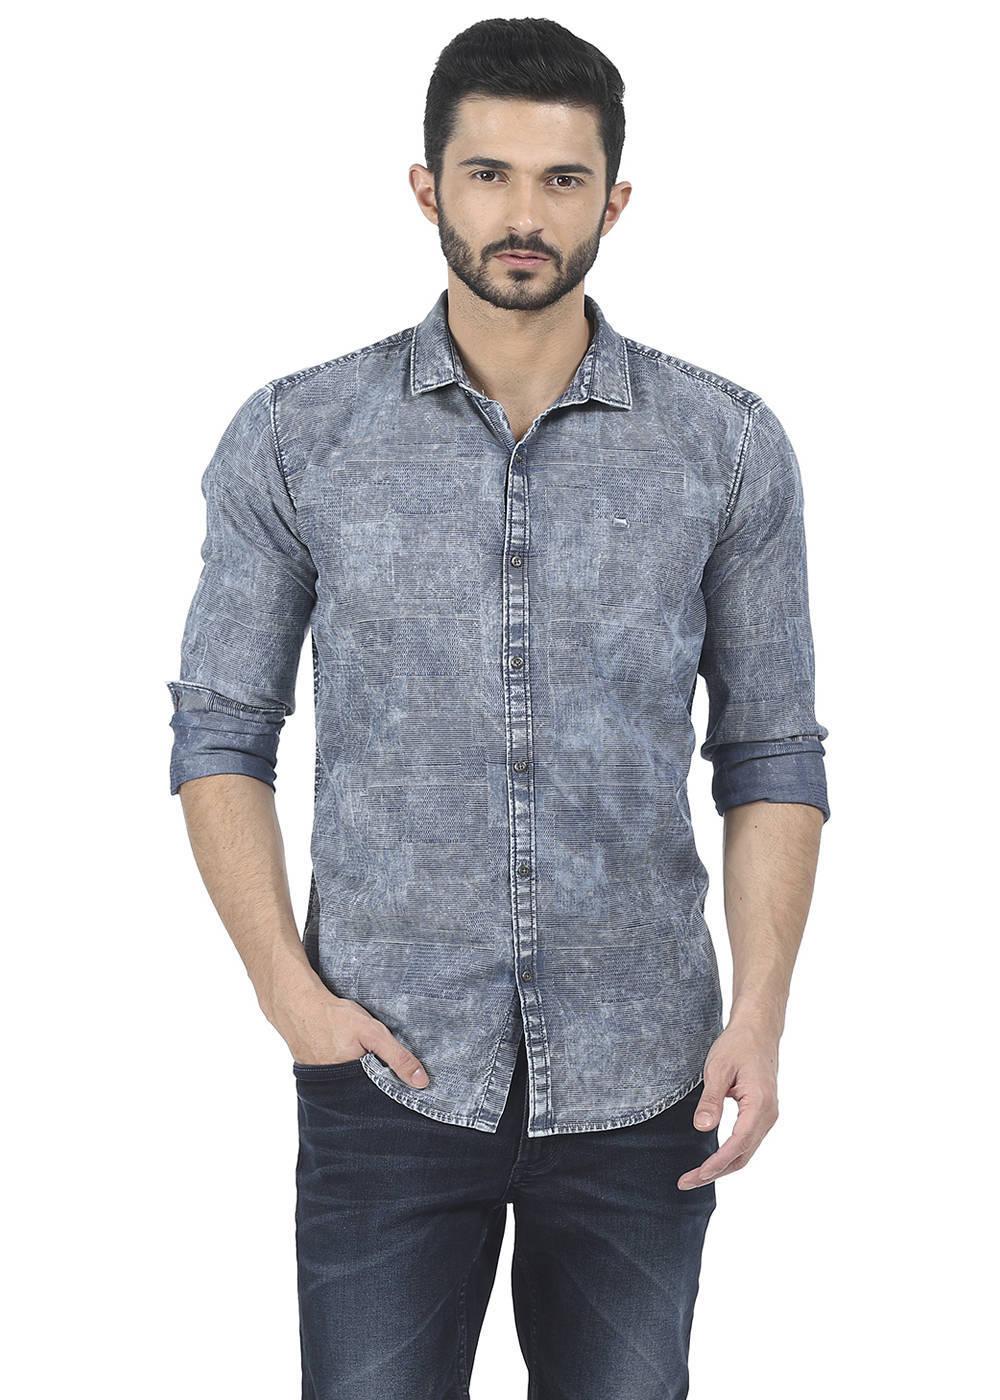 Basics | Basics Slim Fit Eventide Jacquard Indigo Shirt